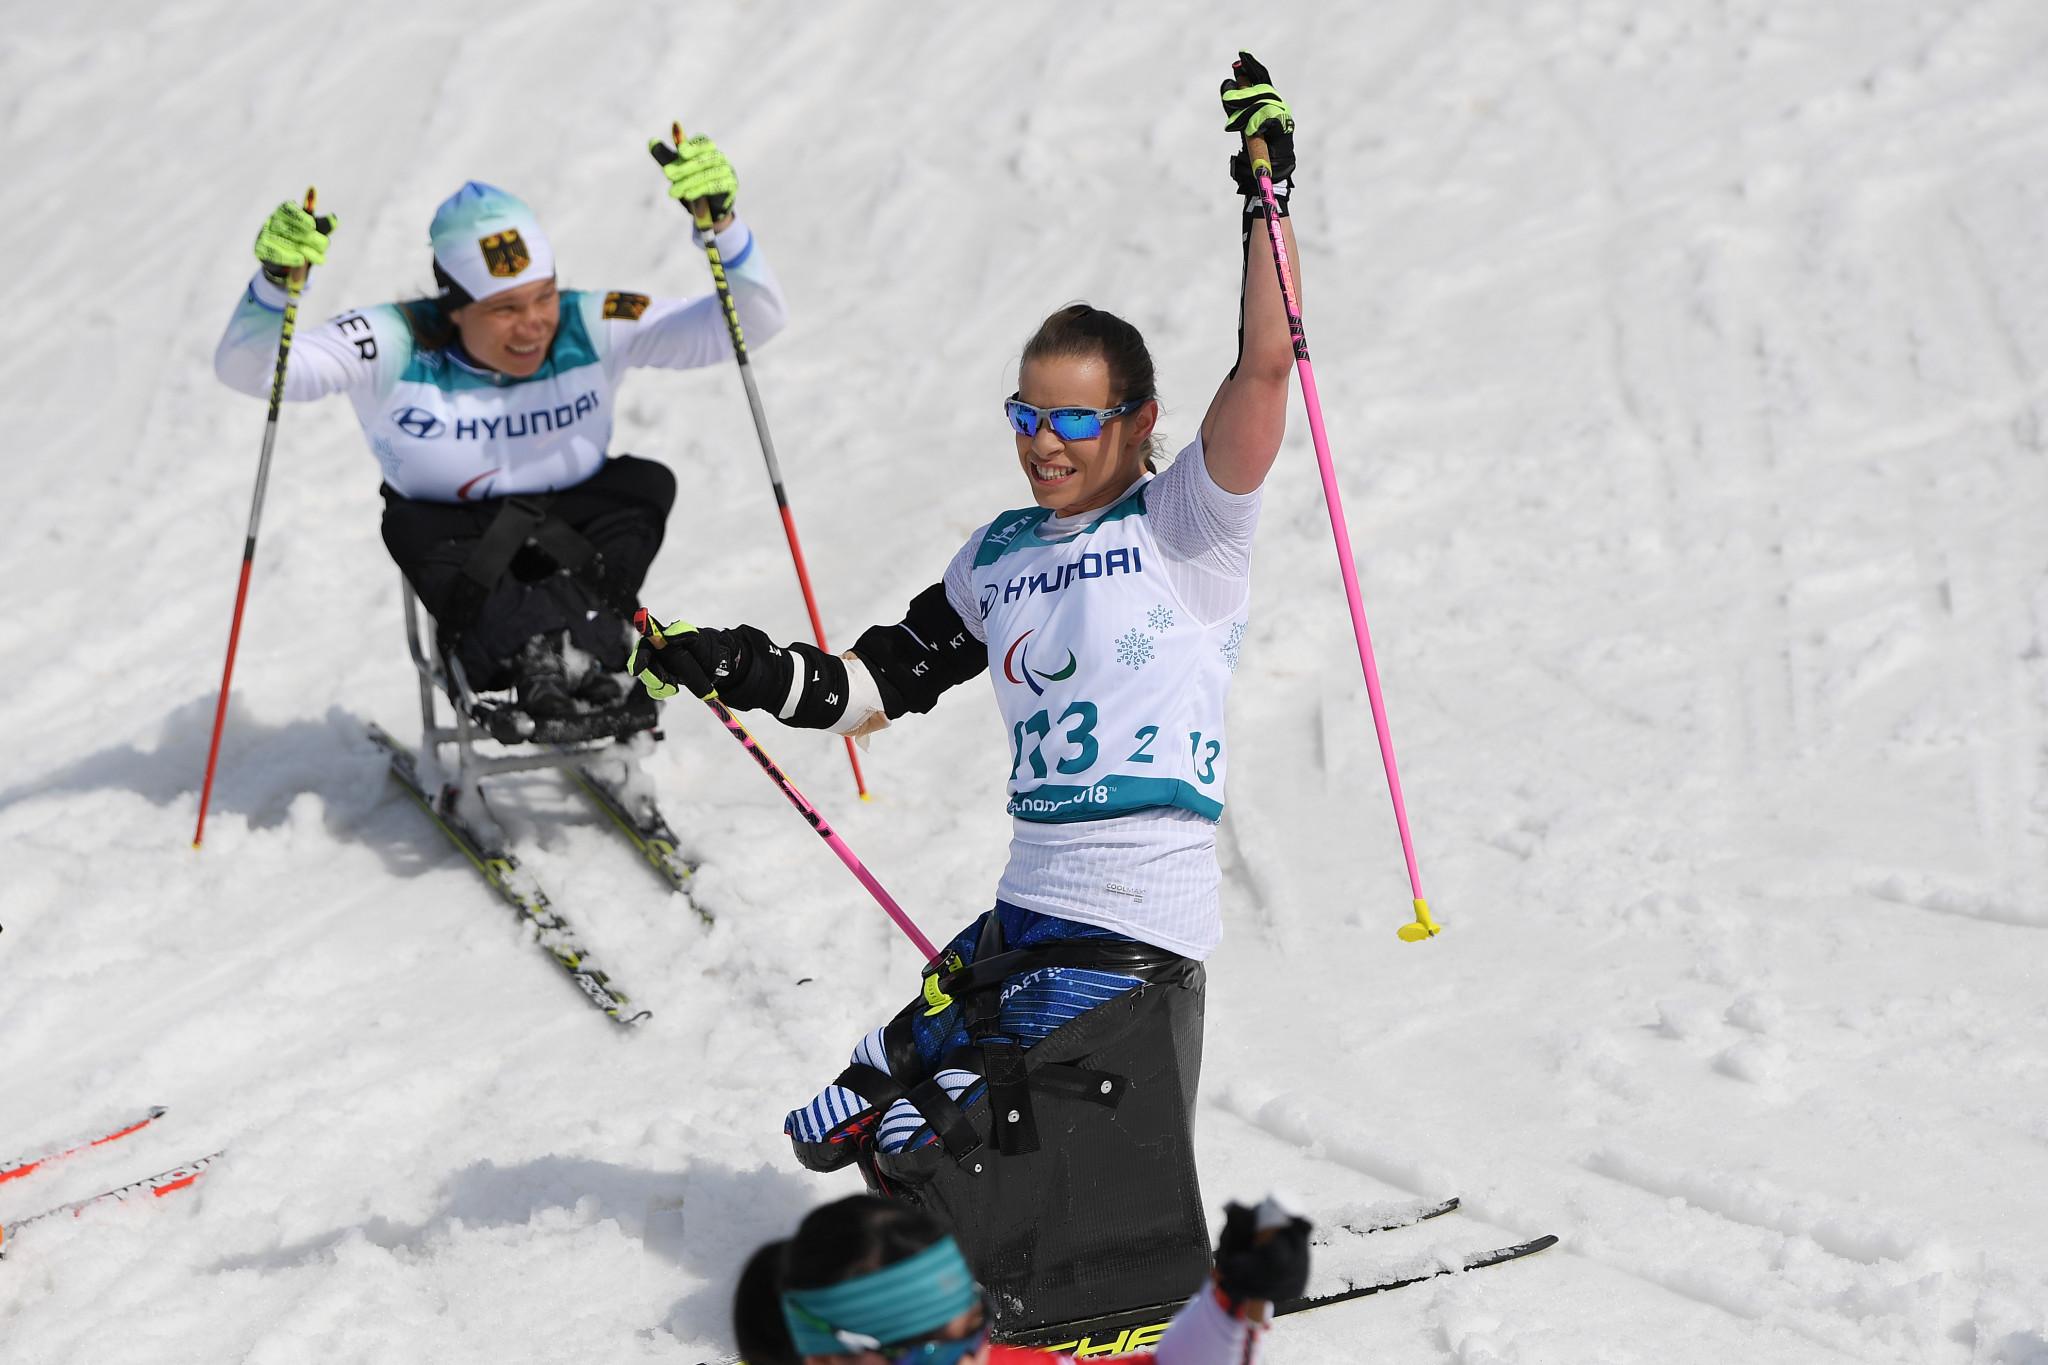 Masters beats American rival Gretsch to win gold at Para Nordic Skiing World Cup